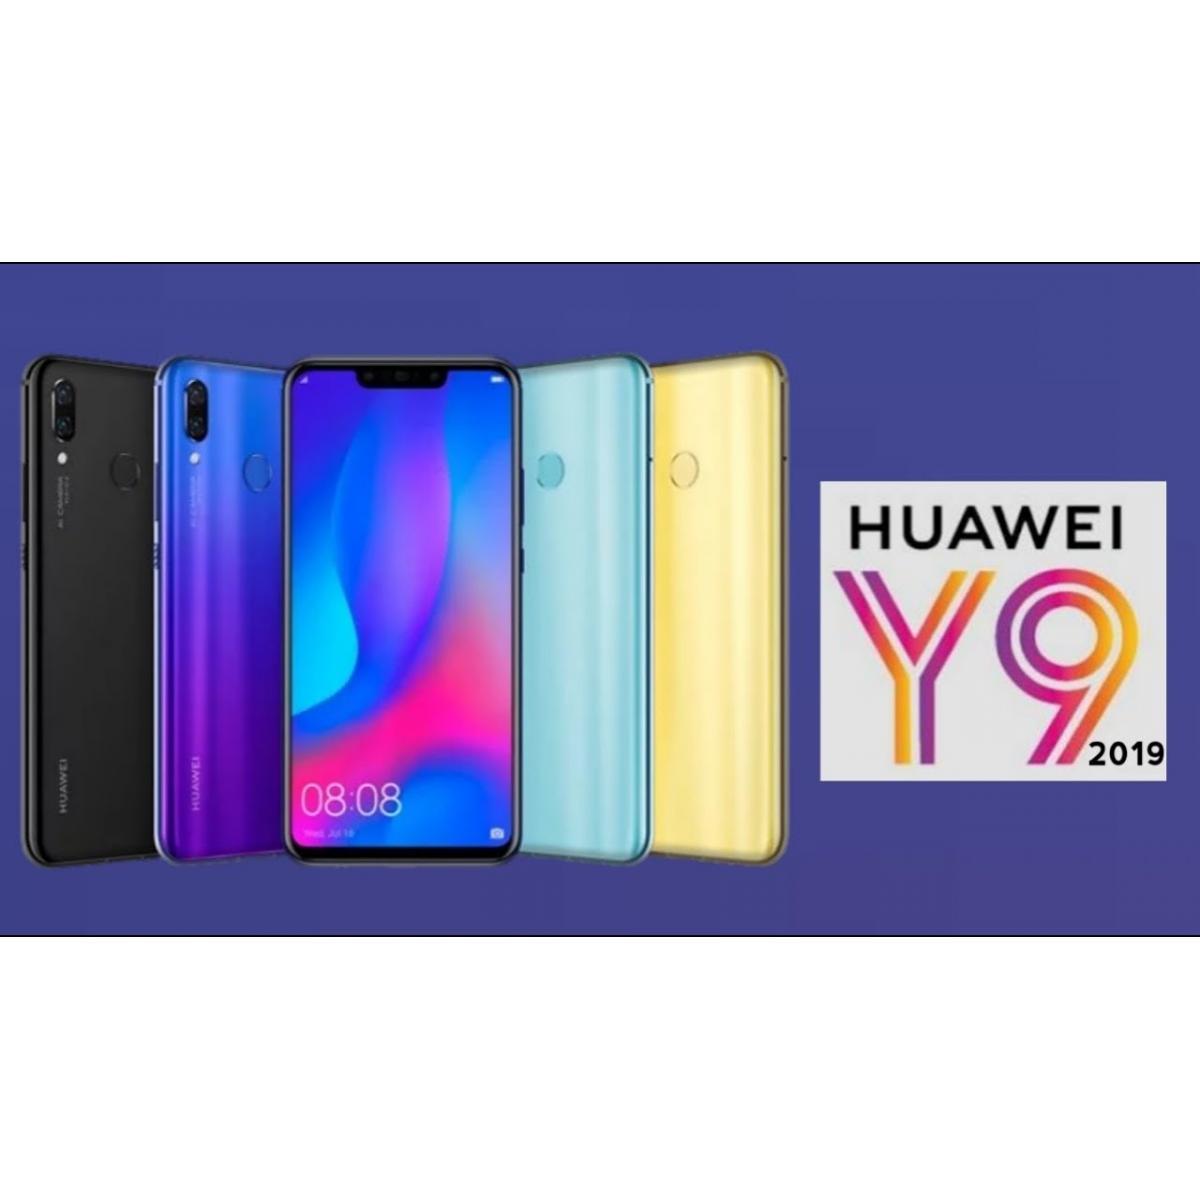 Mobile Phone Huawei Y9 2019 | GTS - Amman Jordan | GTS